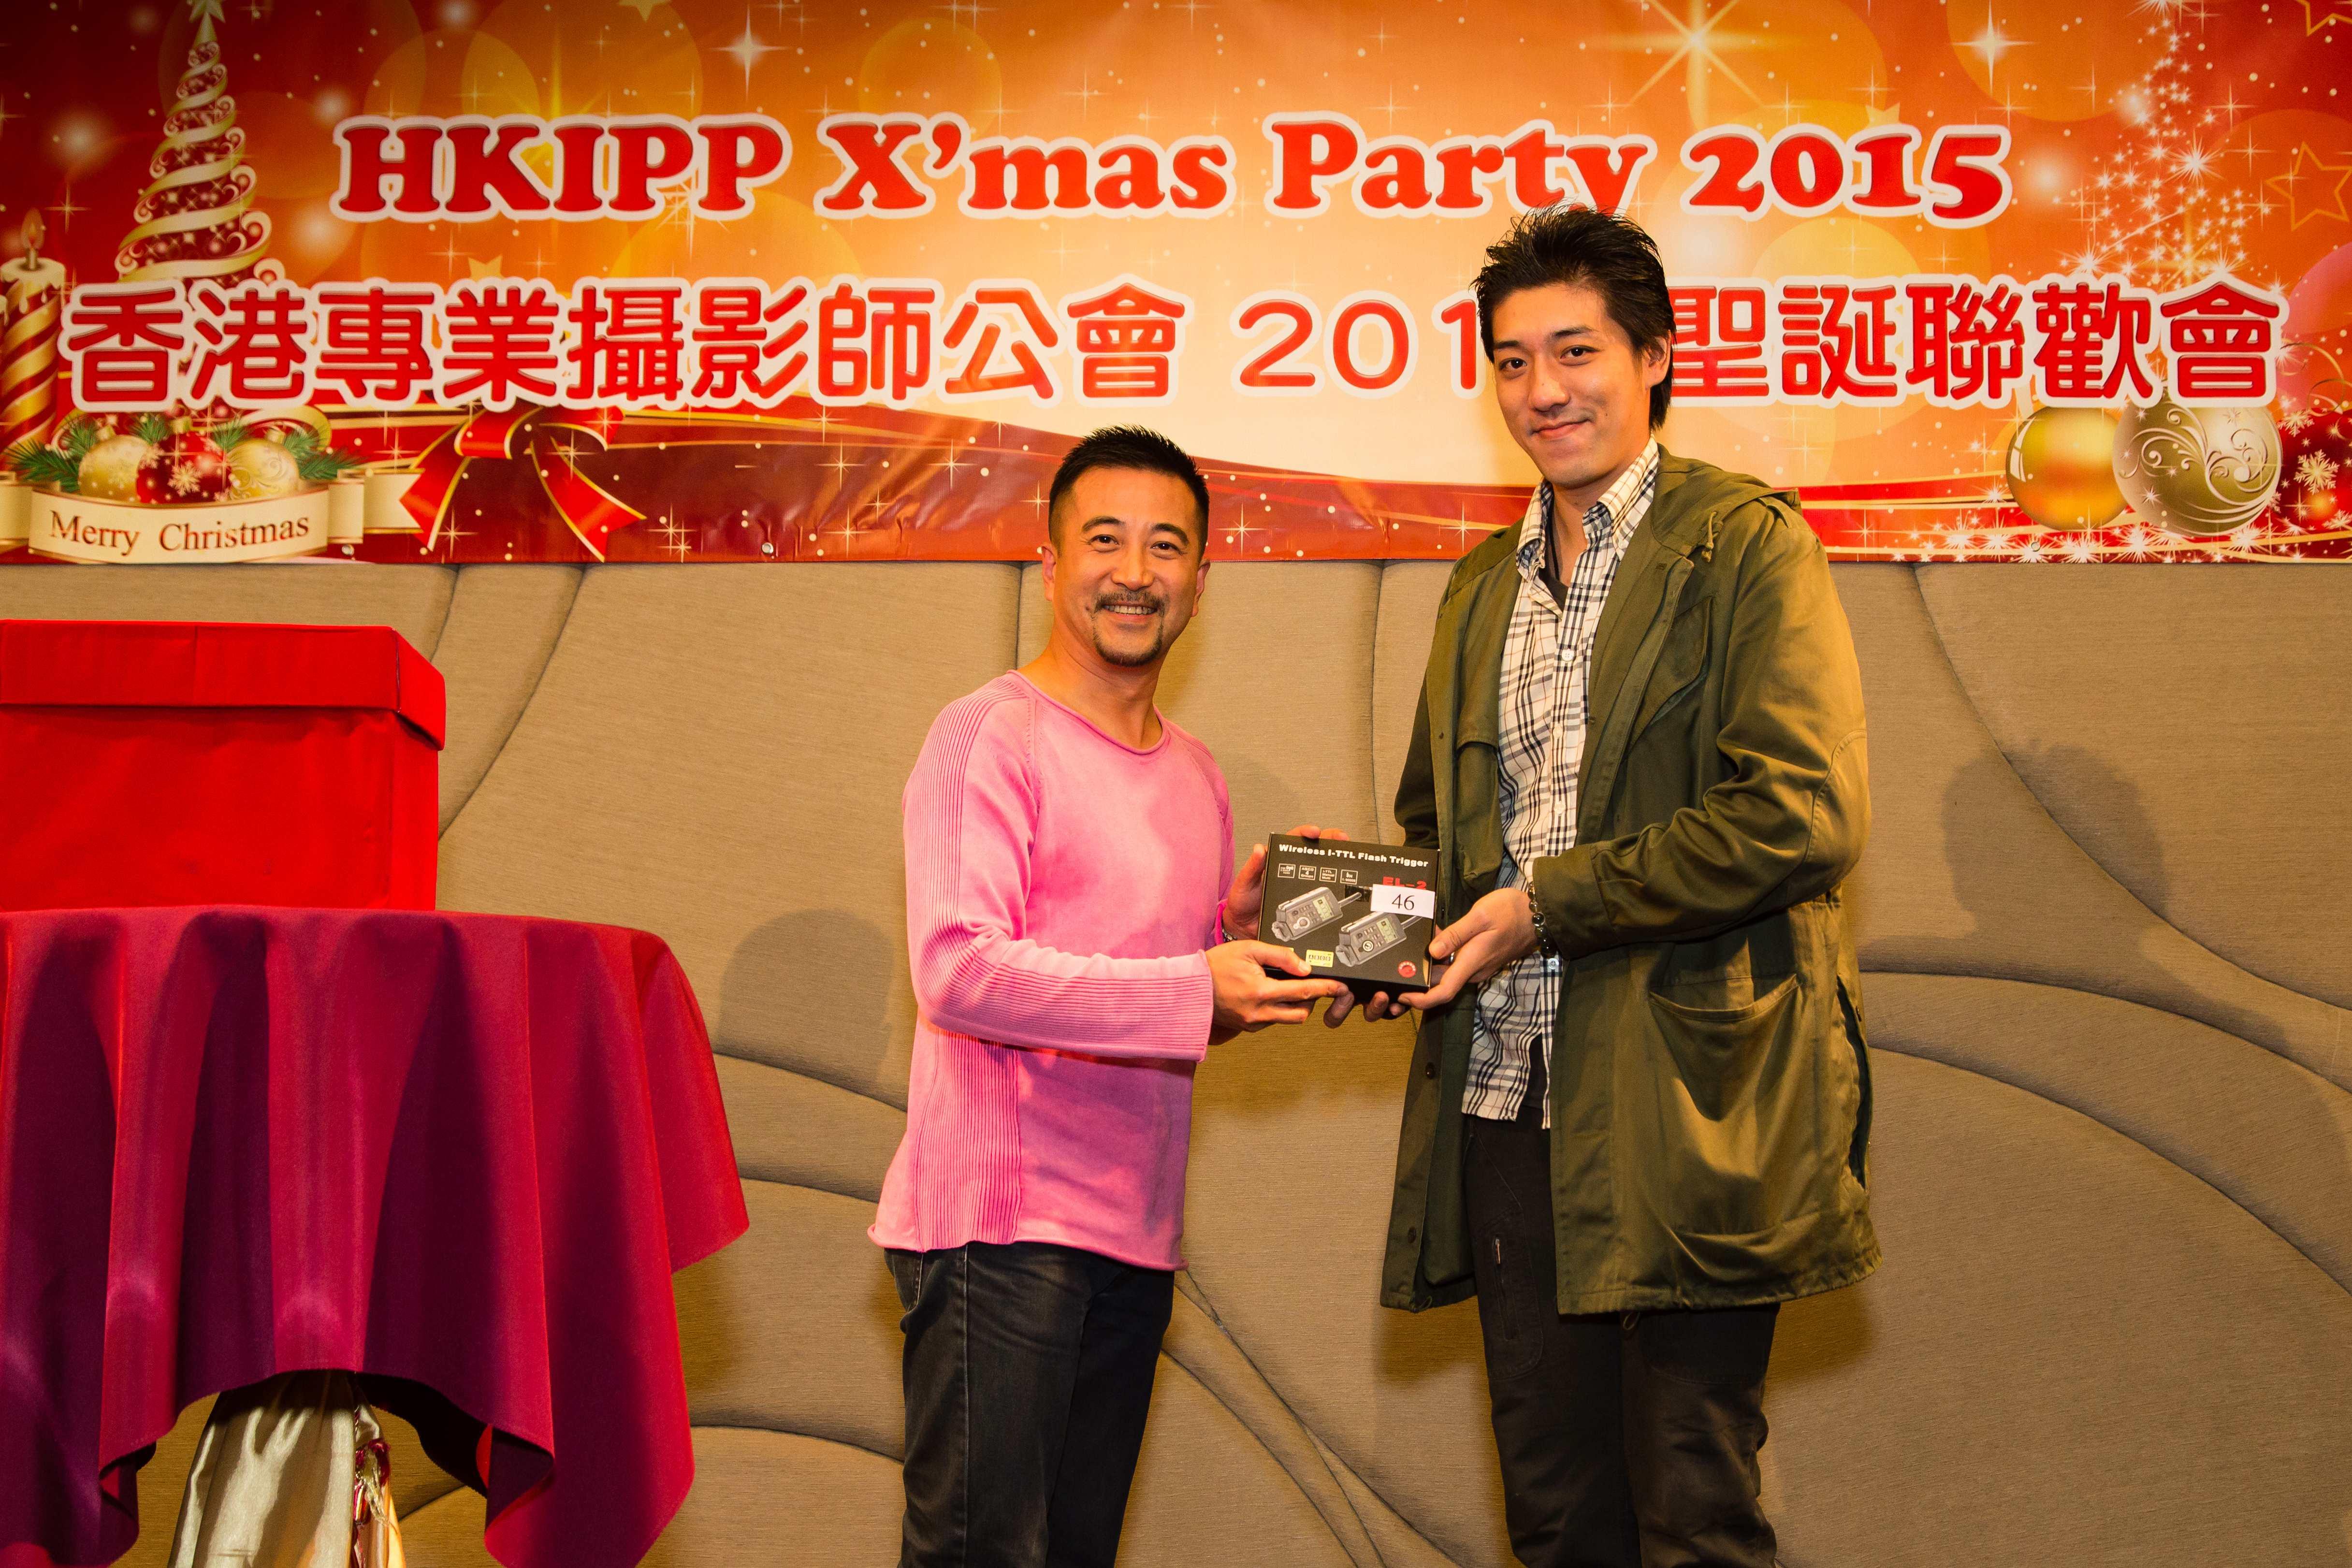 HKIPP X'MASHKIPP2015-0107